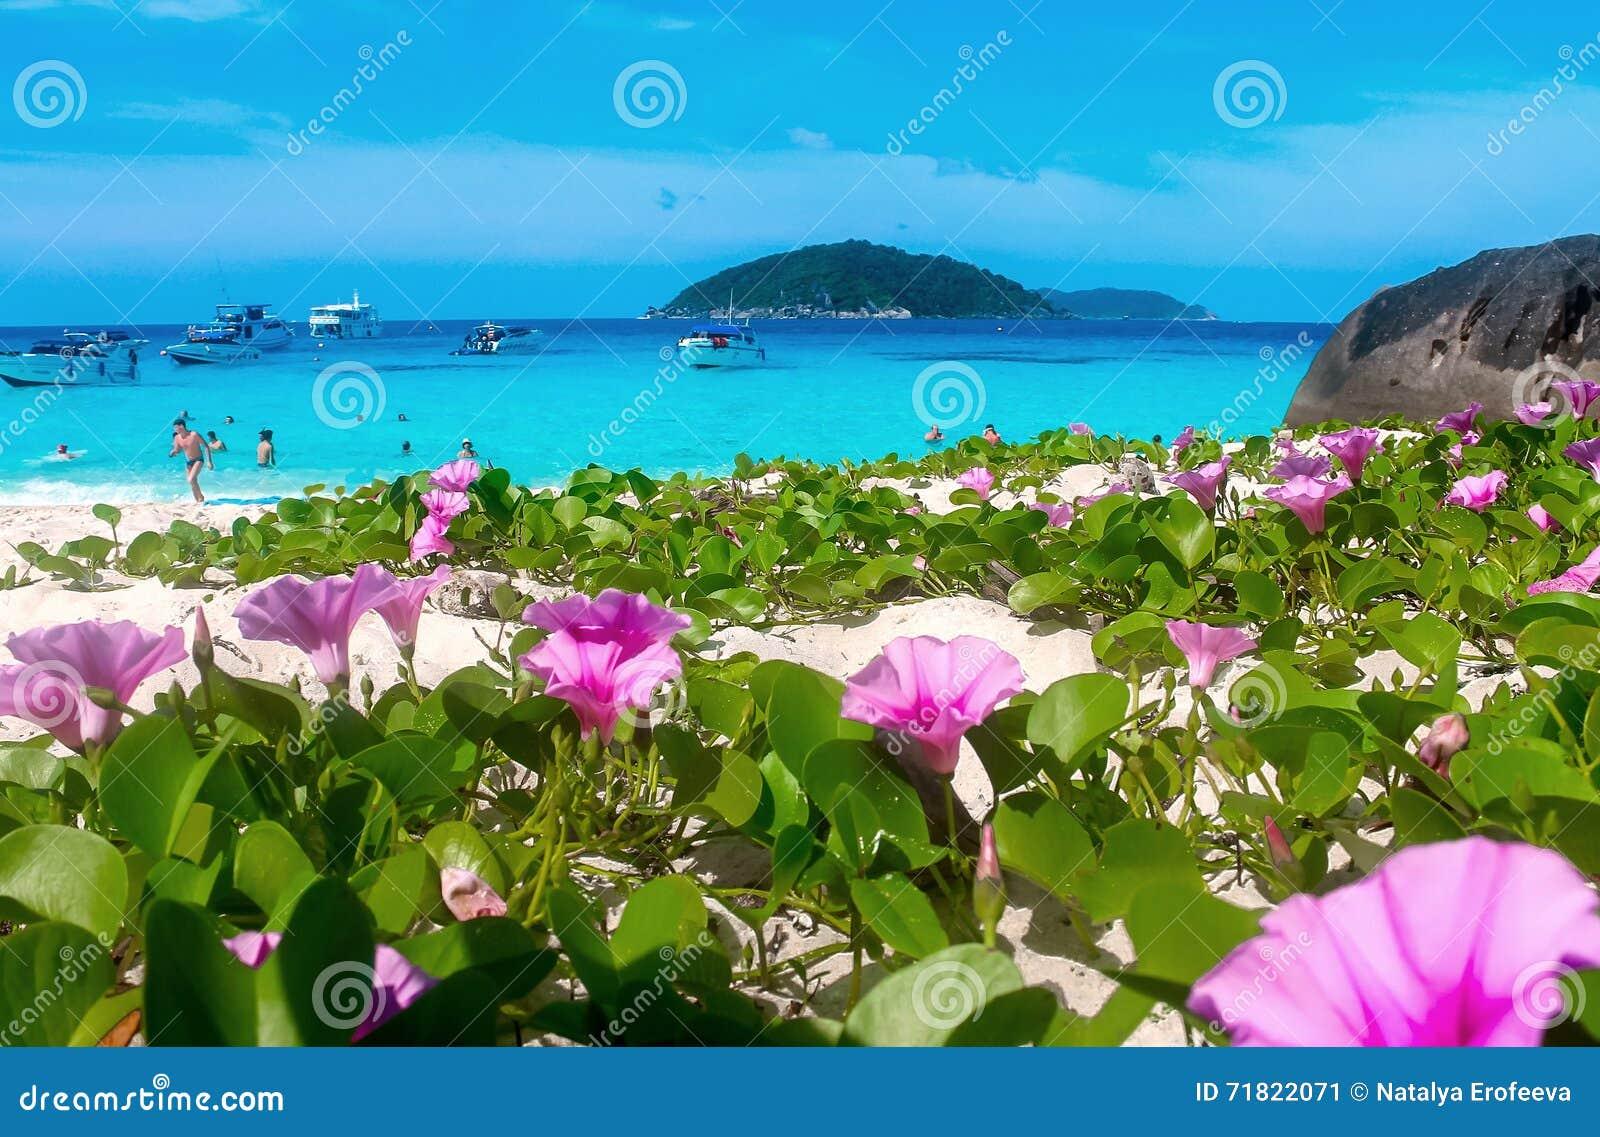 Tropical flowers beach